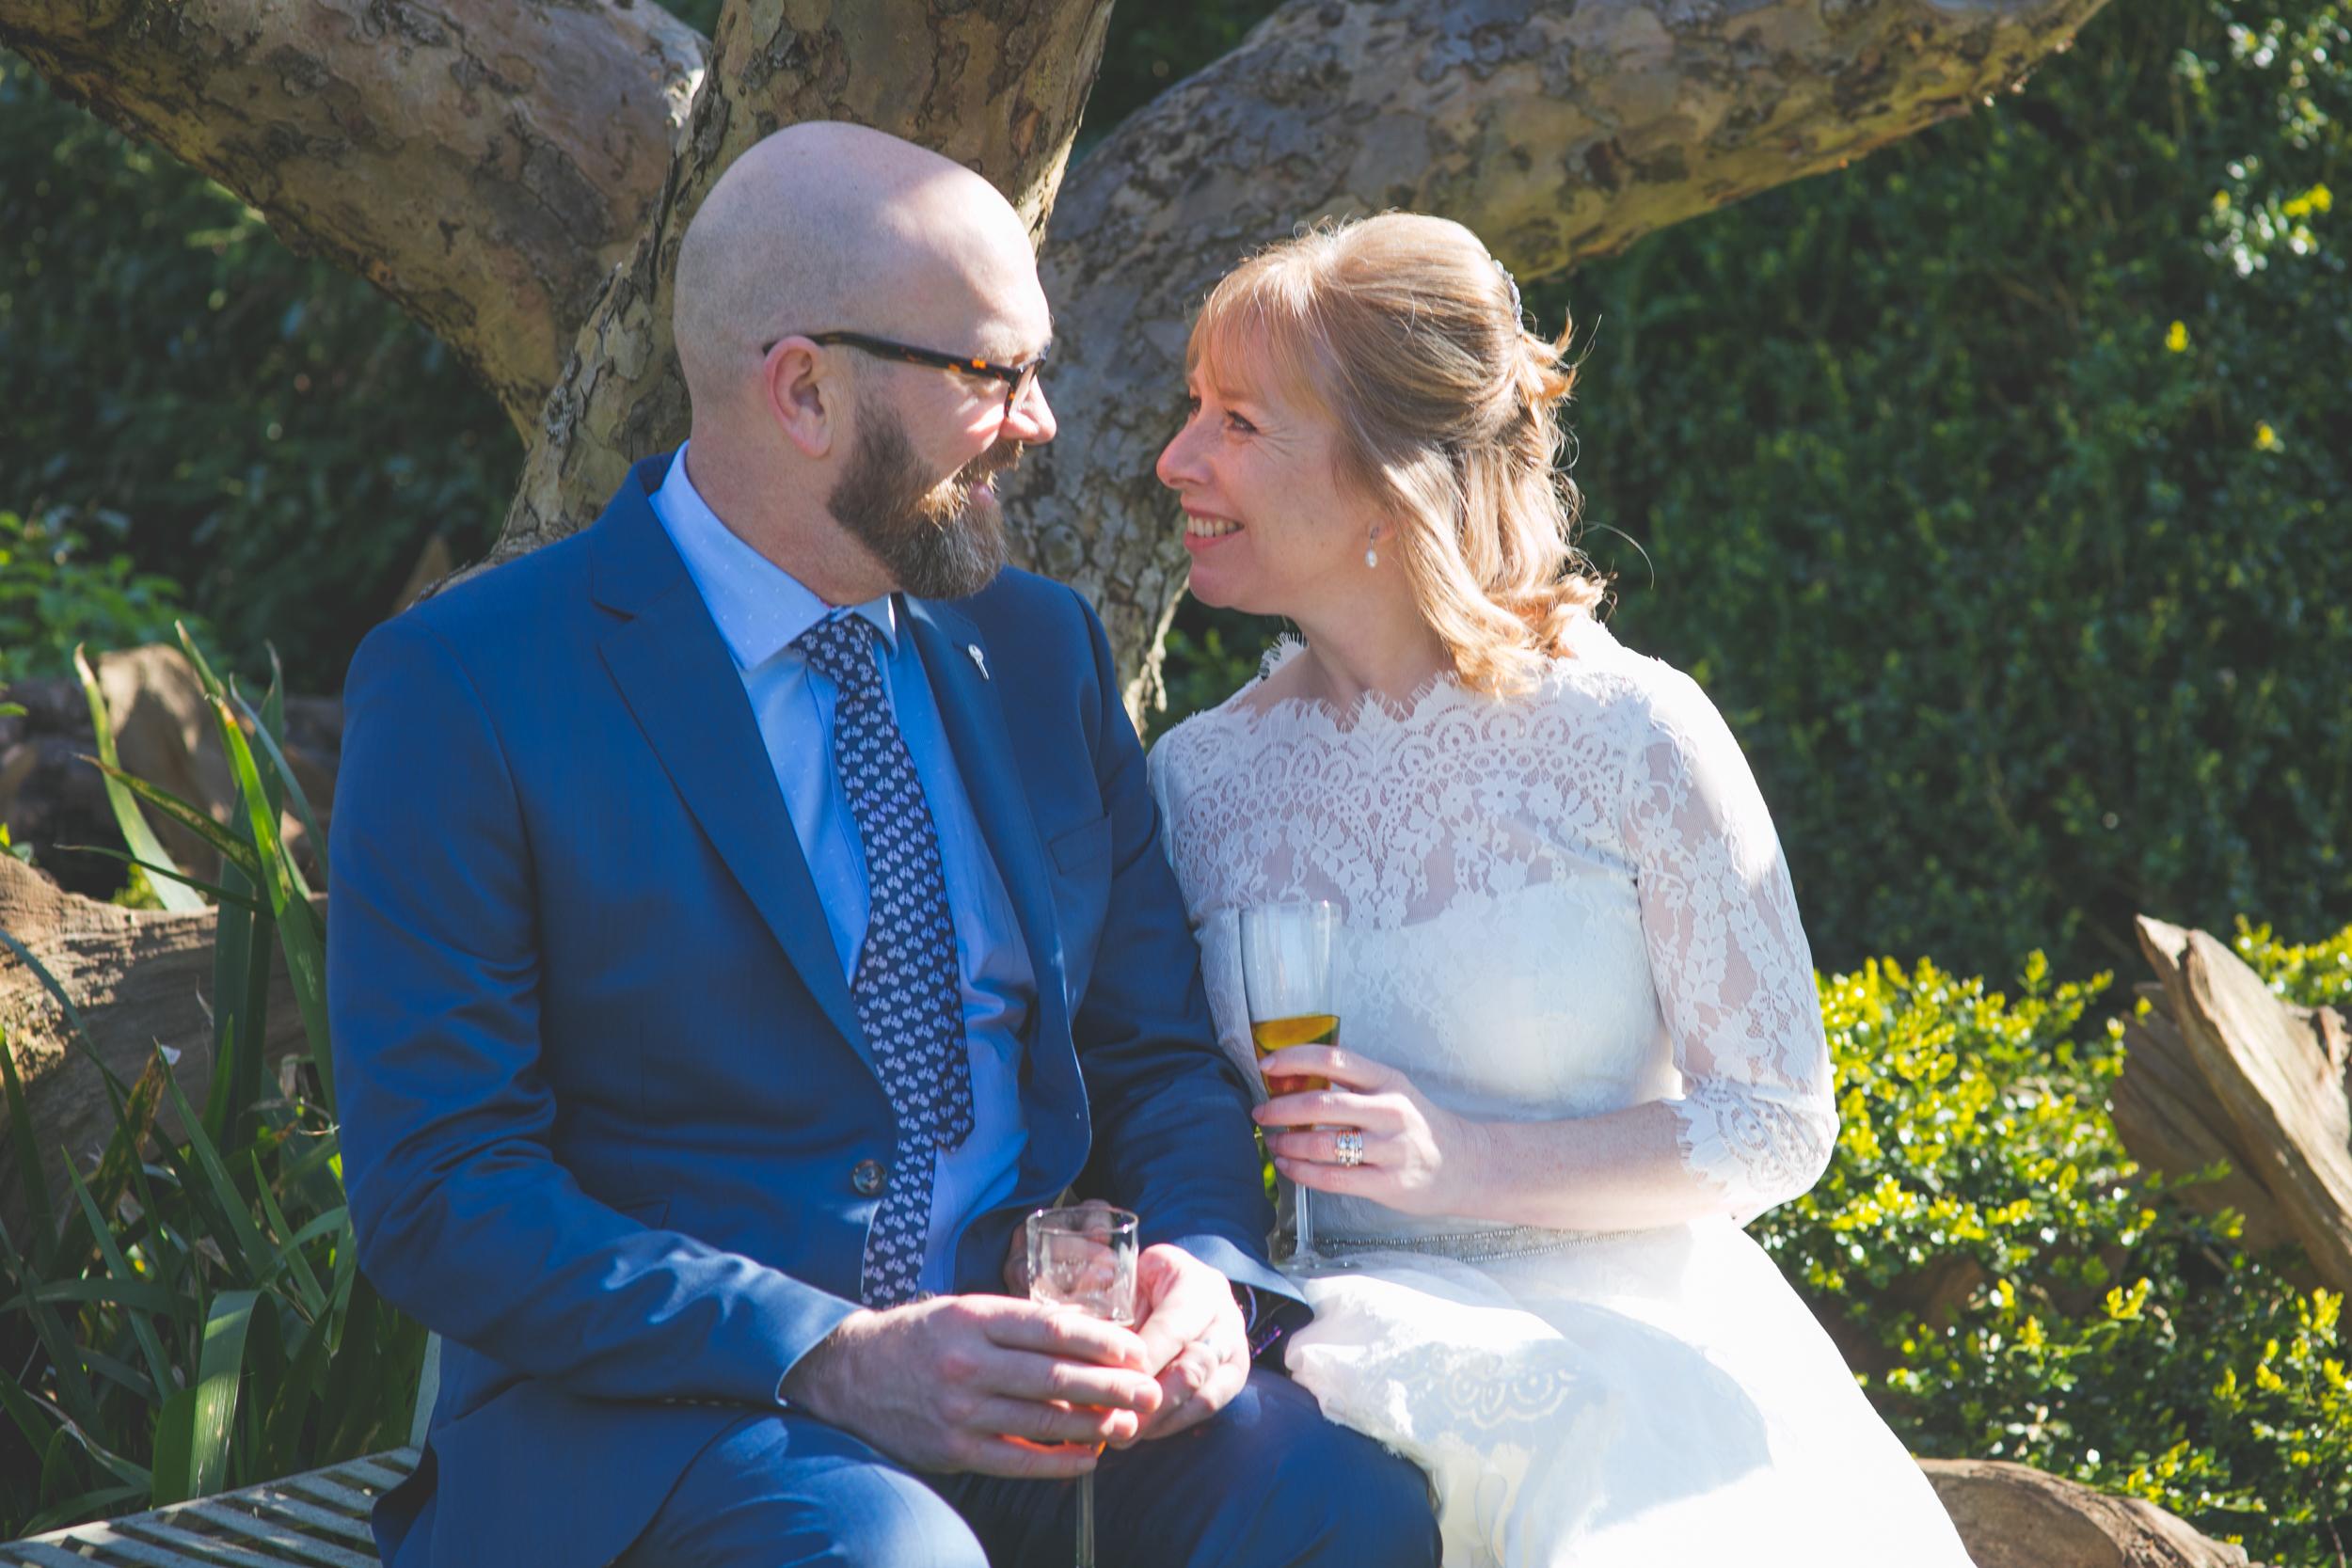 wedding-photography-at-Hill-Close-Gardens-Warwick68.jpg